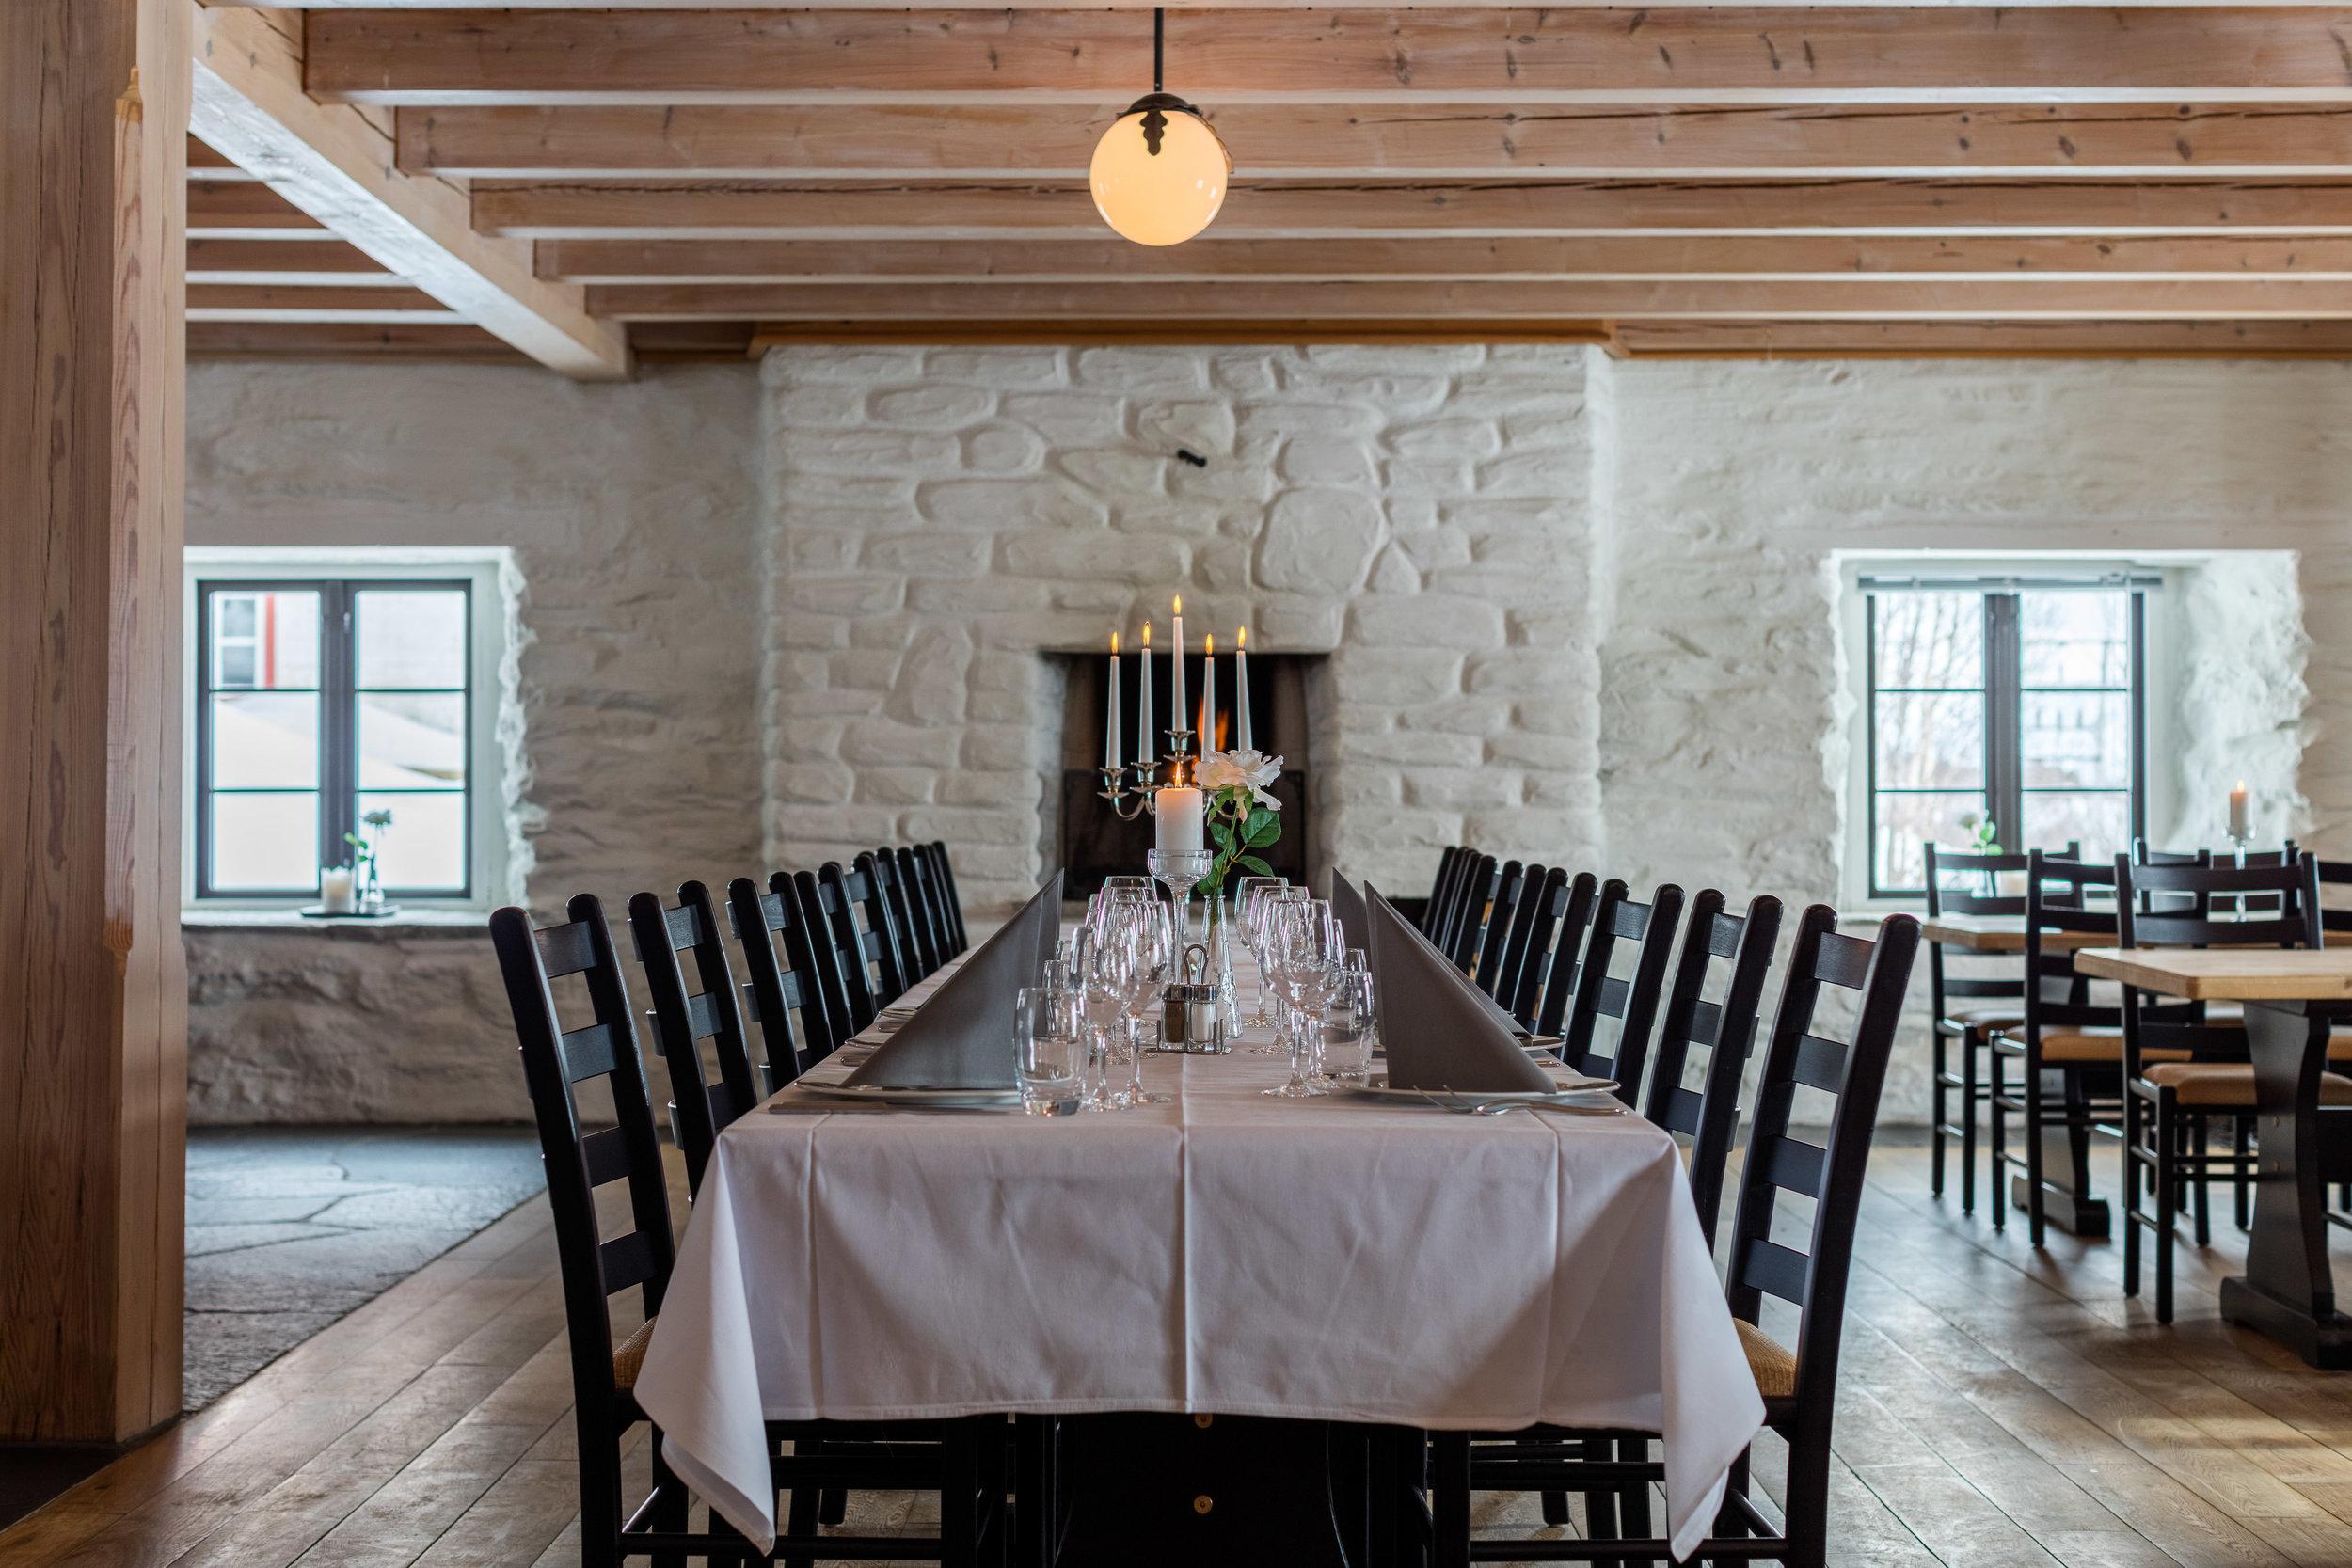 The banquet room in Fjøset